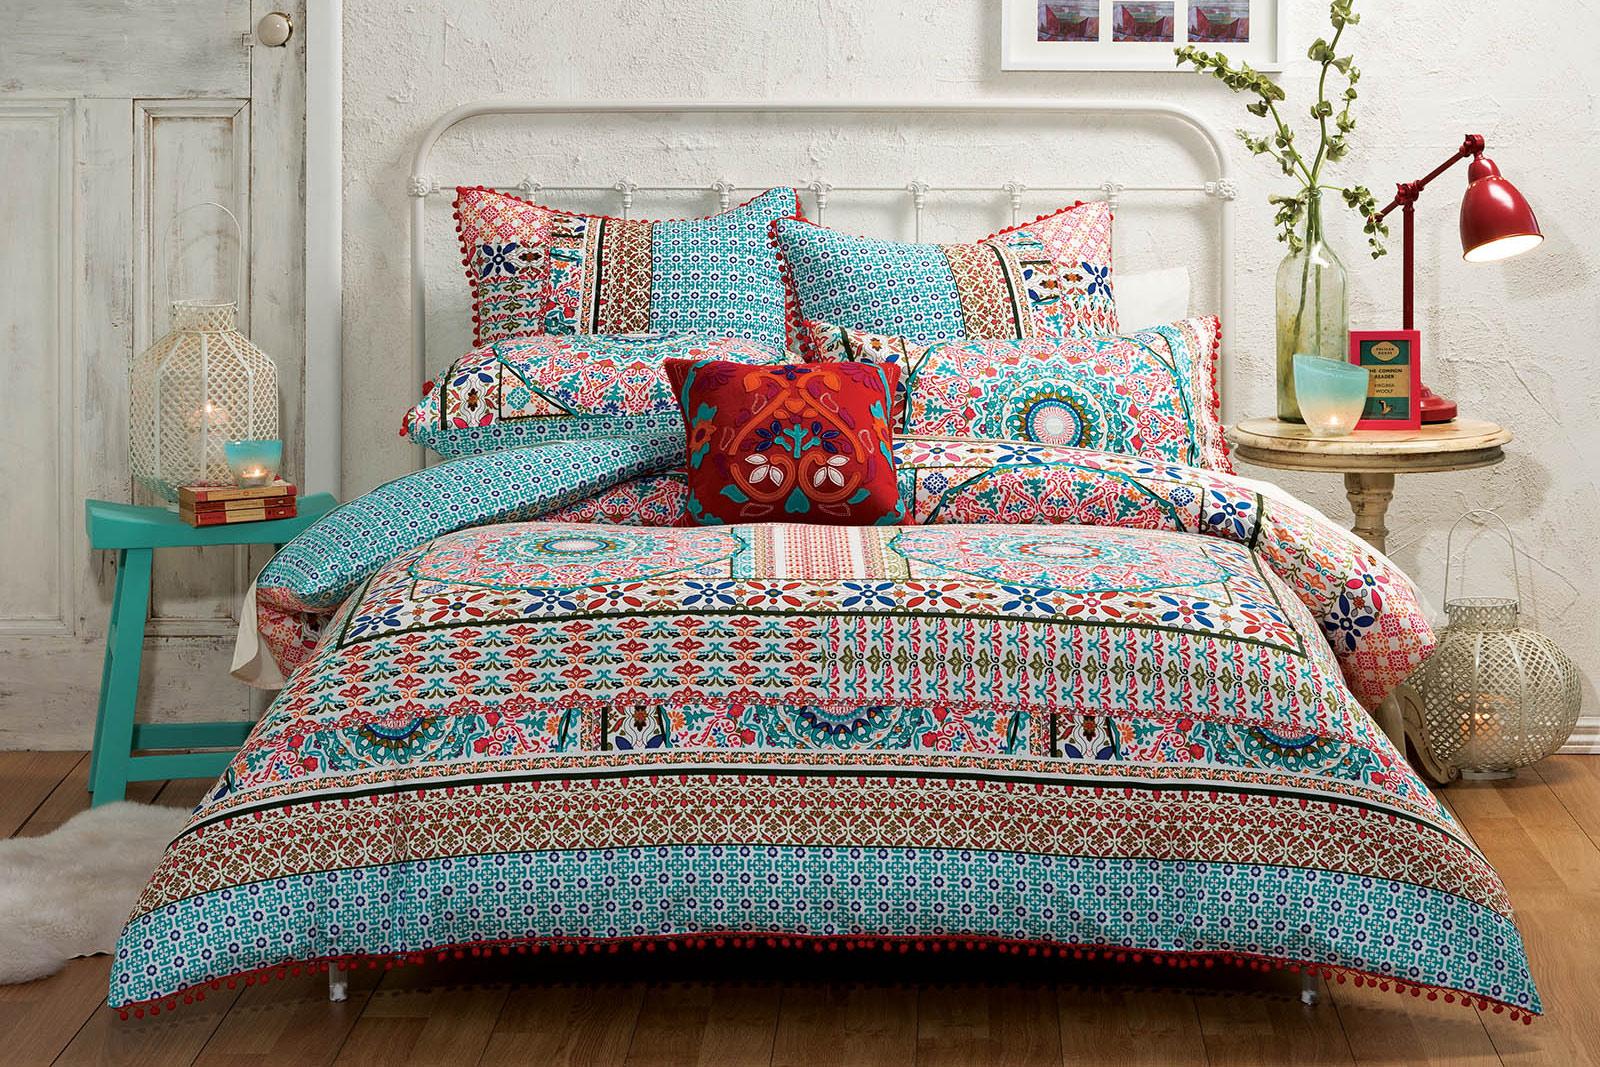 boho bedding: Shop for boho bedding on Wheretoget